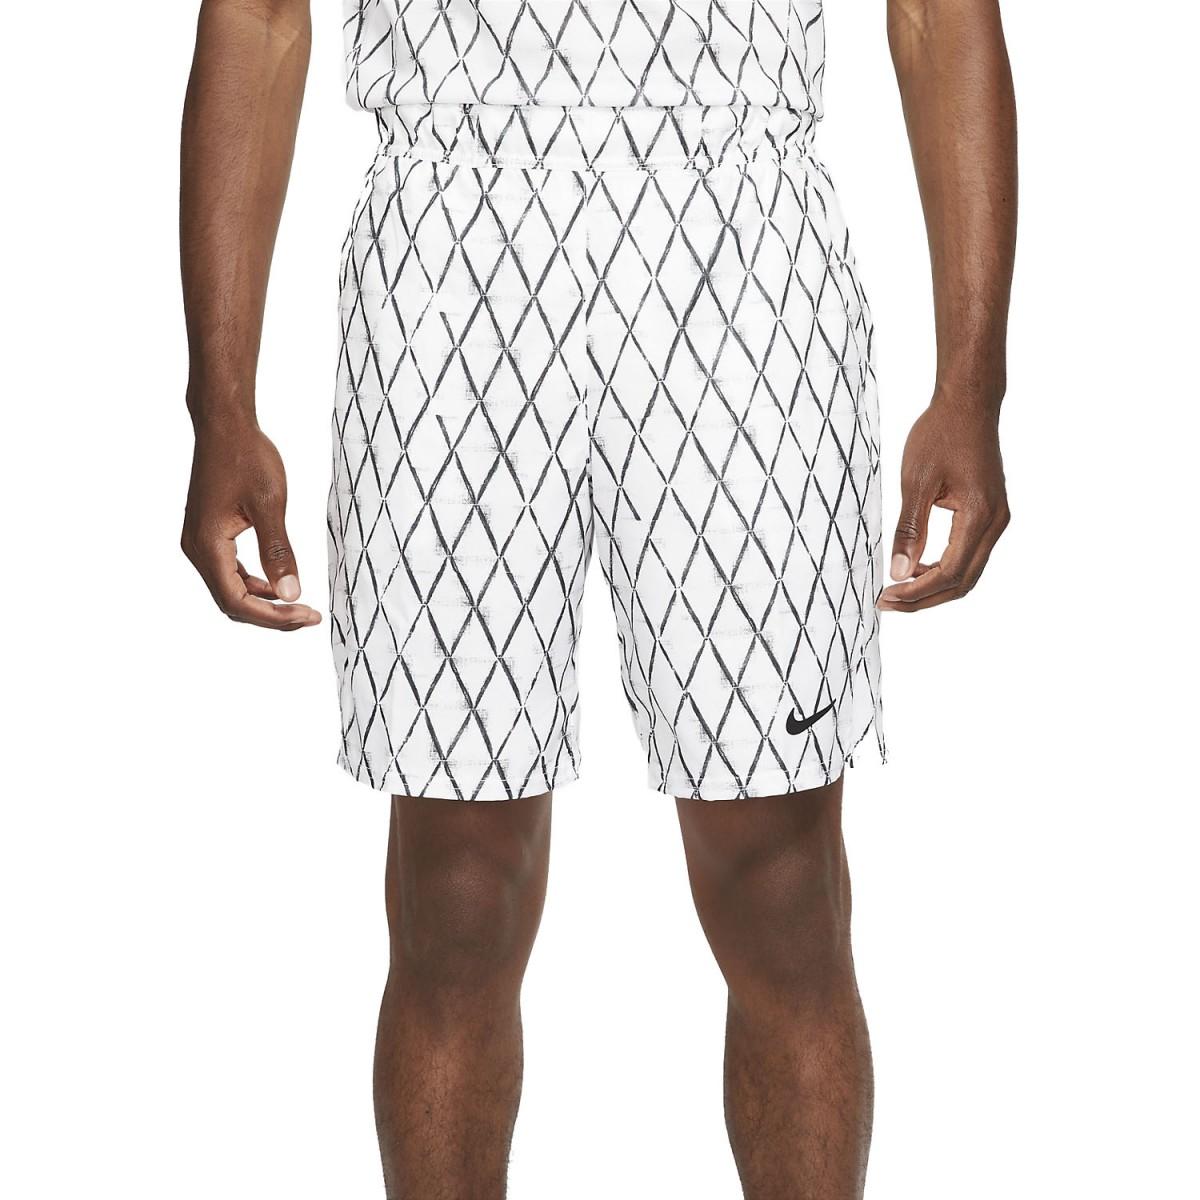 Теннисные шорты мужские Nike Court Victory Short 9in Printed white/black